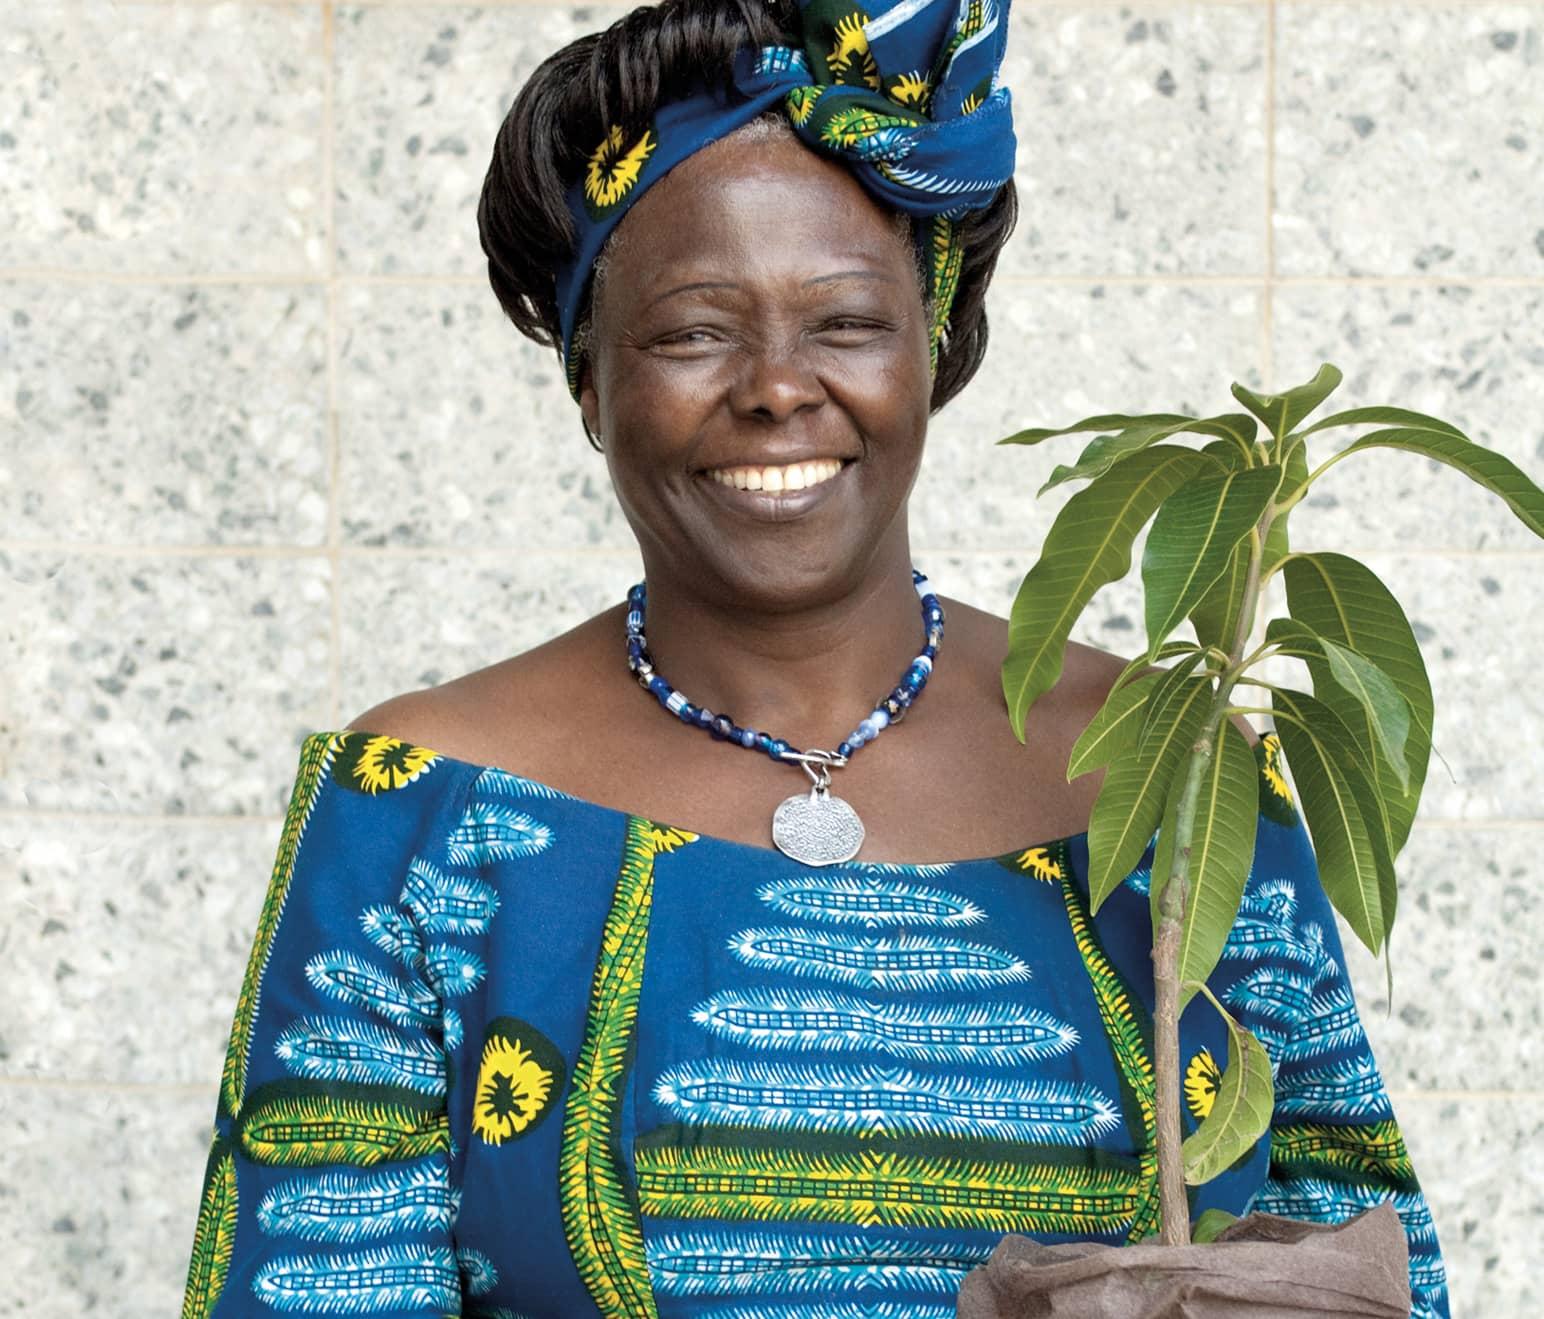 Wangari Maathai prix Nobel de la paix et marraine de la campagne Plant for the planet de l'ONU